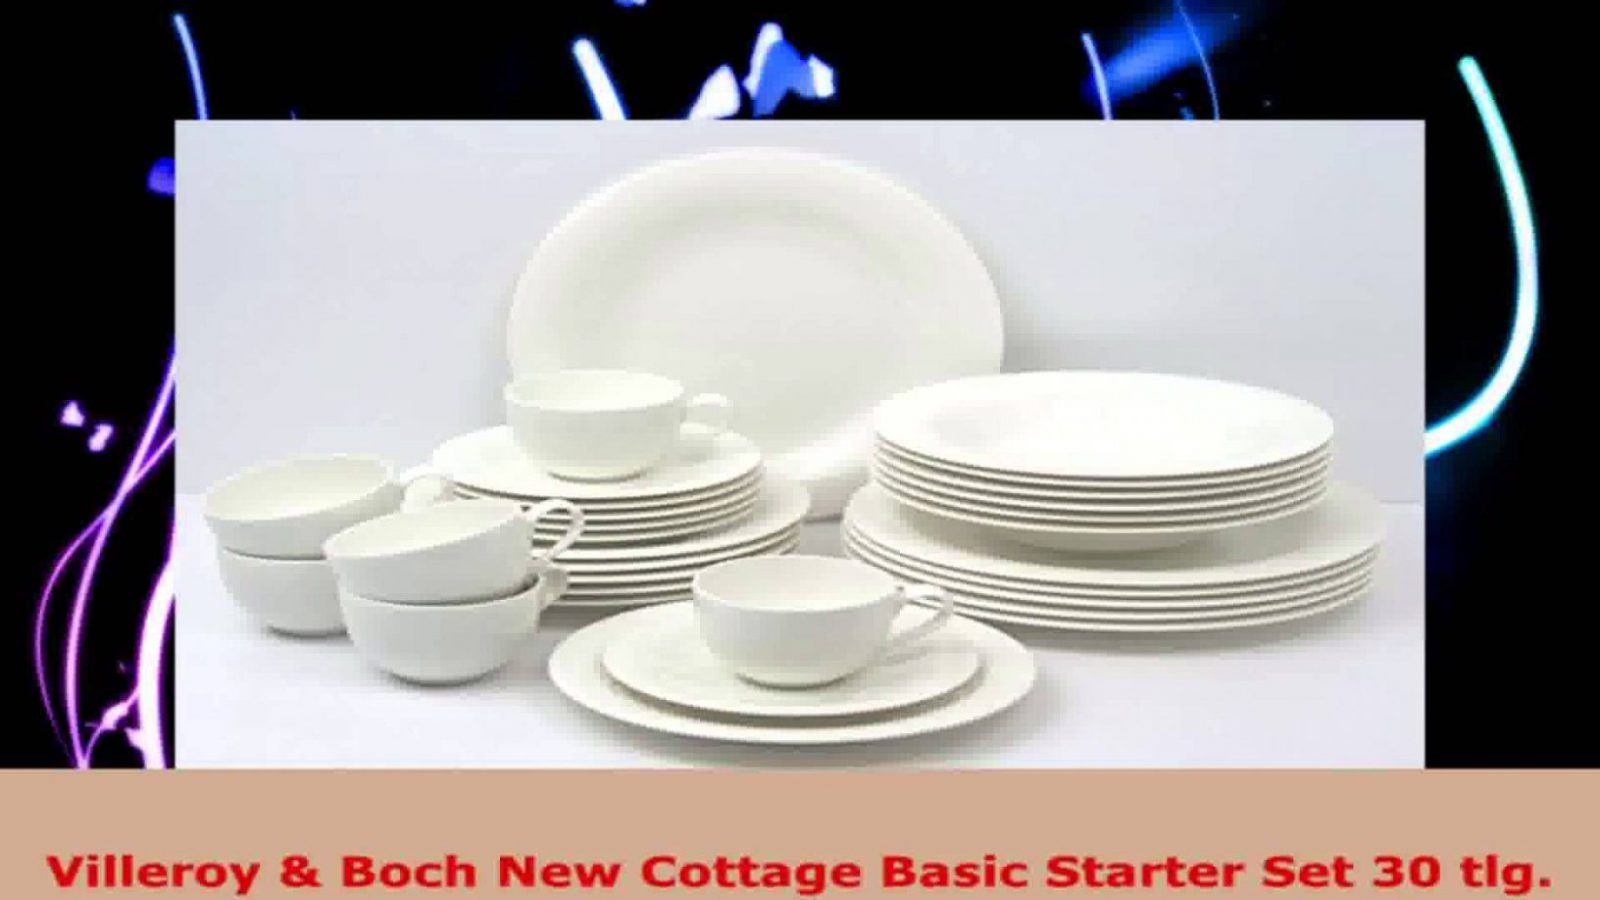 Villeroy Boch New Cottage Basic Starter Set 30 Tlg  Youtube von Villeroy & Boch Royal Basic Set 30 Tlg Bild